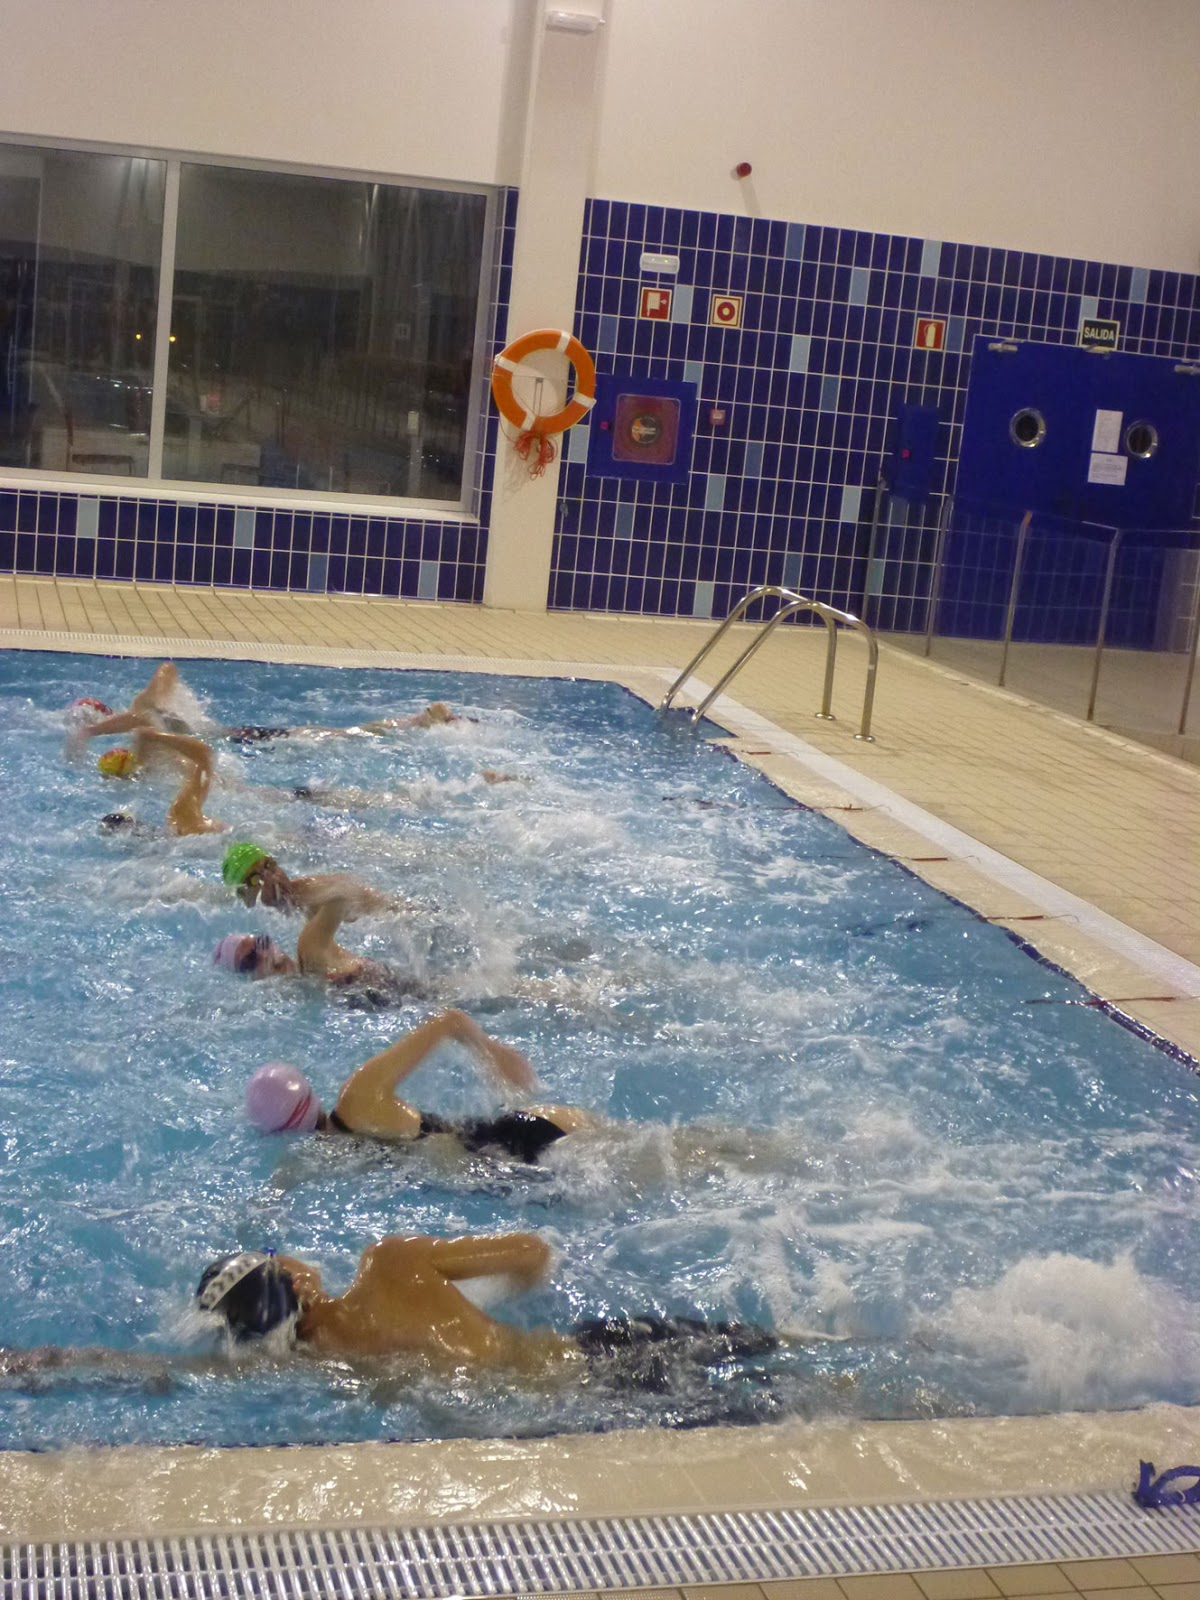 Natacion estatica entrenamiento de nataci n en grupo for Piscinas rectangulares desmontables decathlon